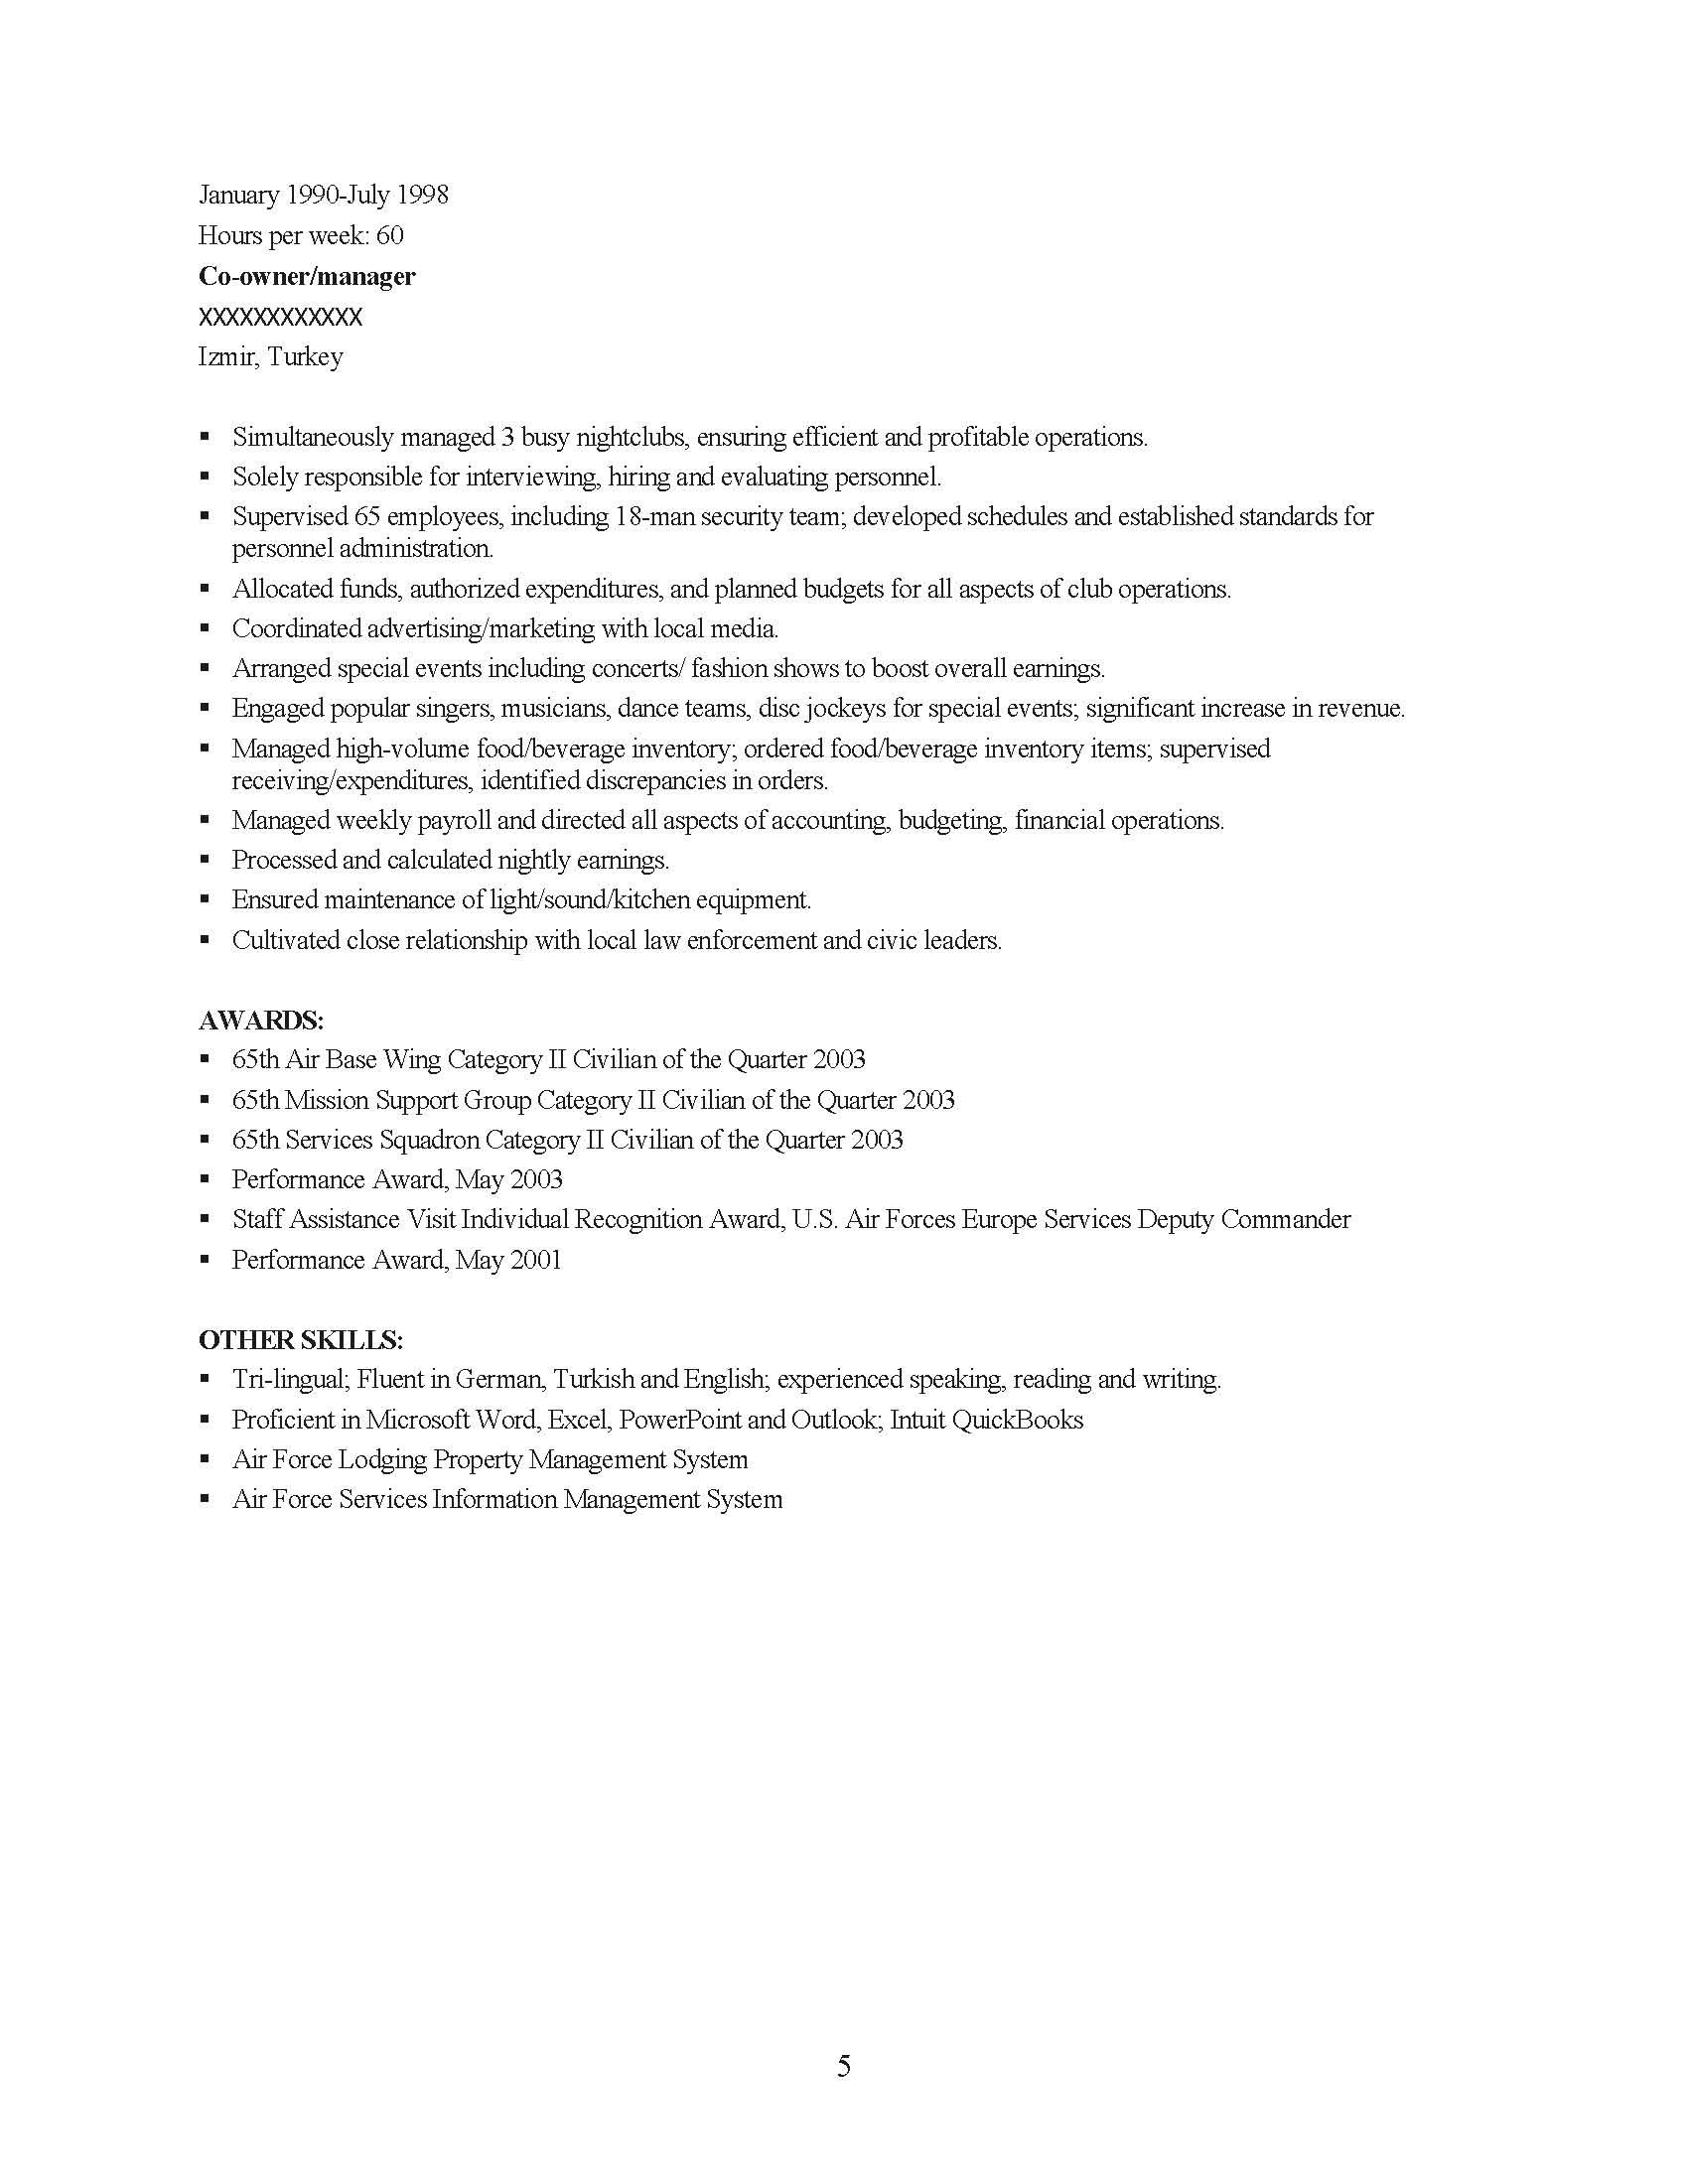 Senior Management Professional Resume Sample - Before-5